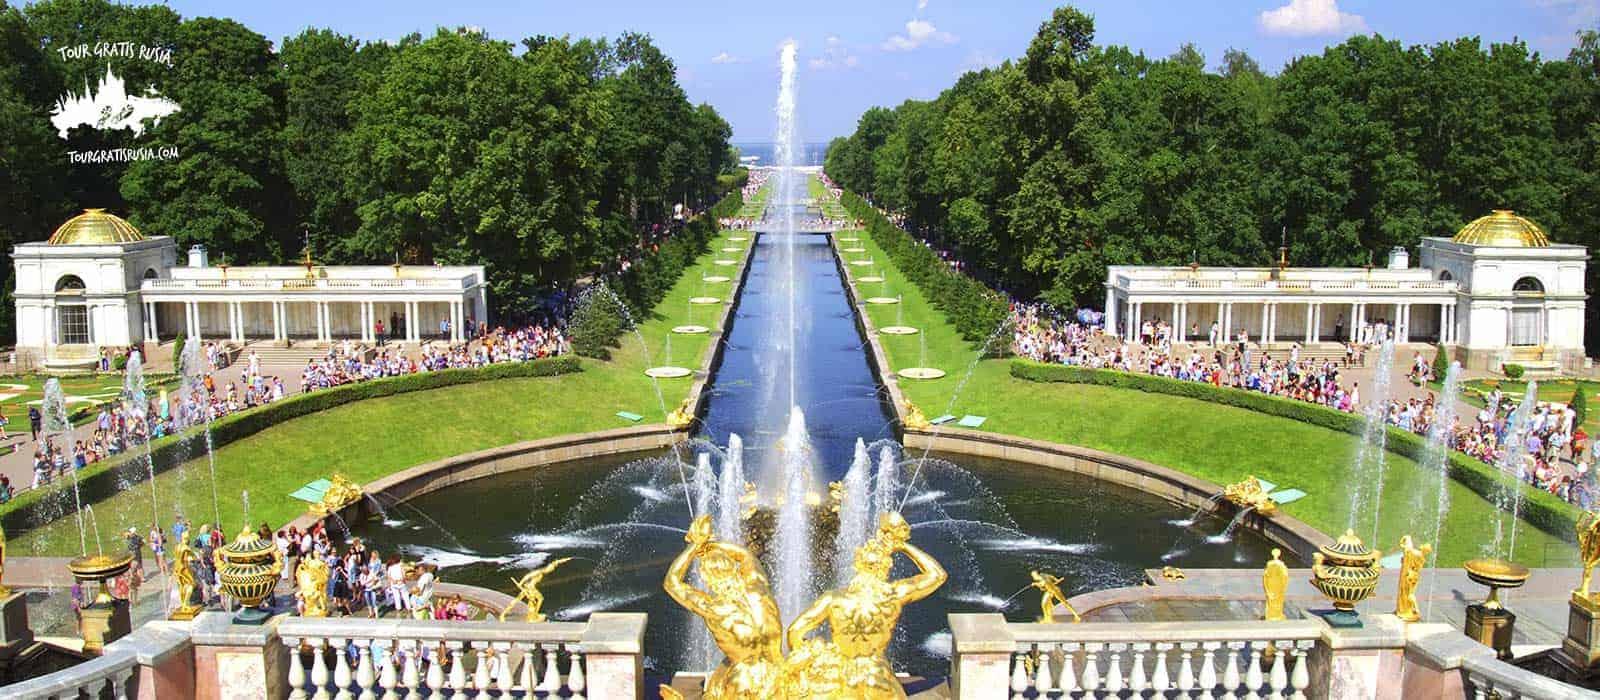 Tour combinado por Peterhof y la Avenida Nevsky